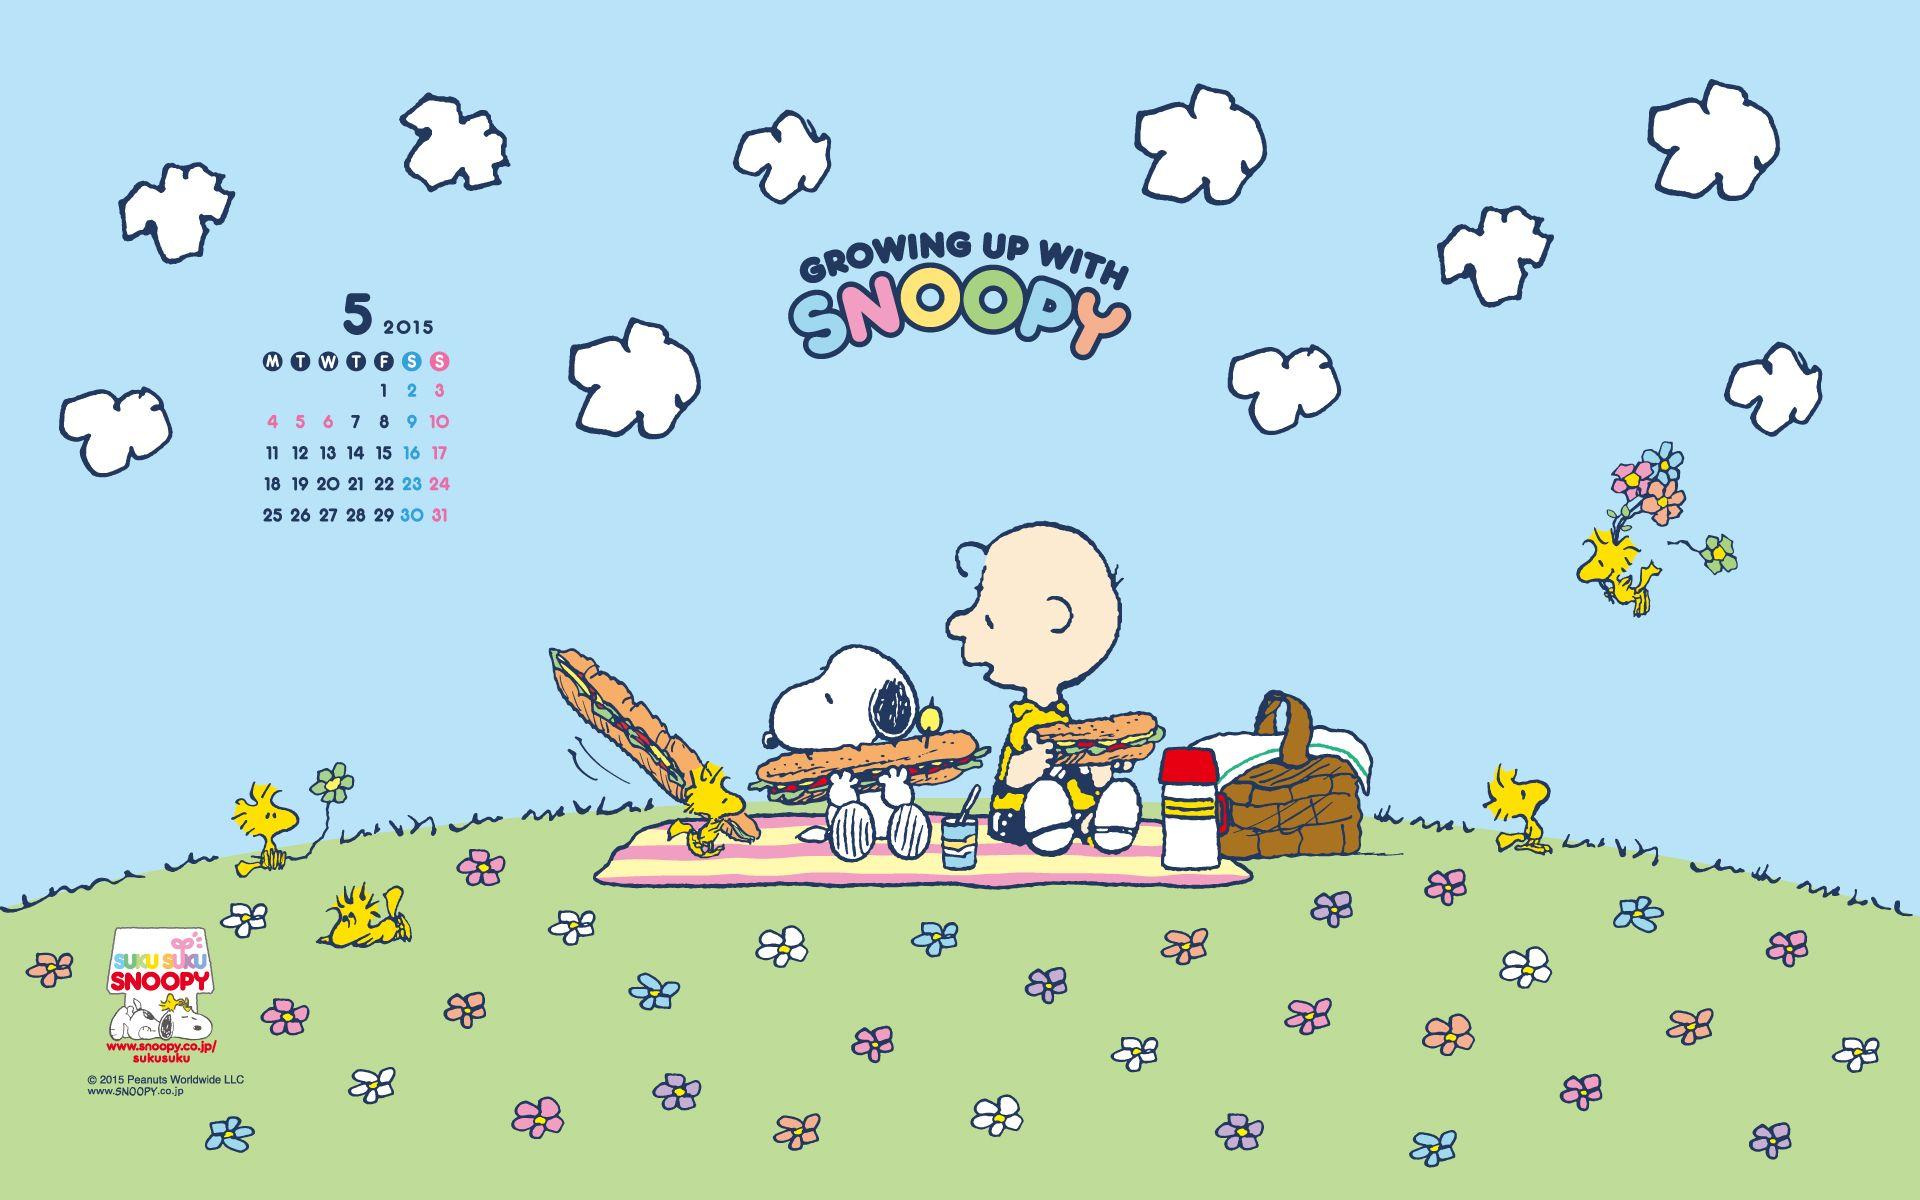 Http Www Snoopy Co Jp Sukusuku Images Wallpaper 1505 W19 Jpg スヌーピー 愛 スヌーピー ハッピーダンス